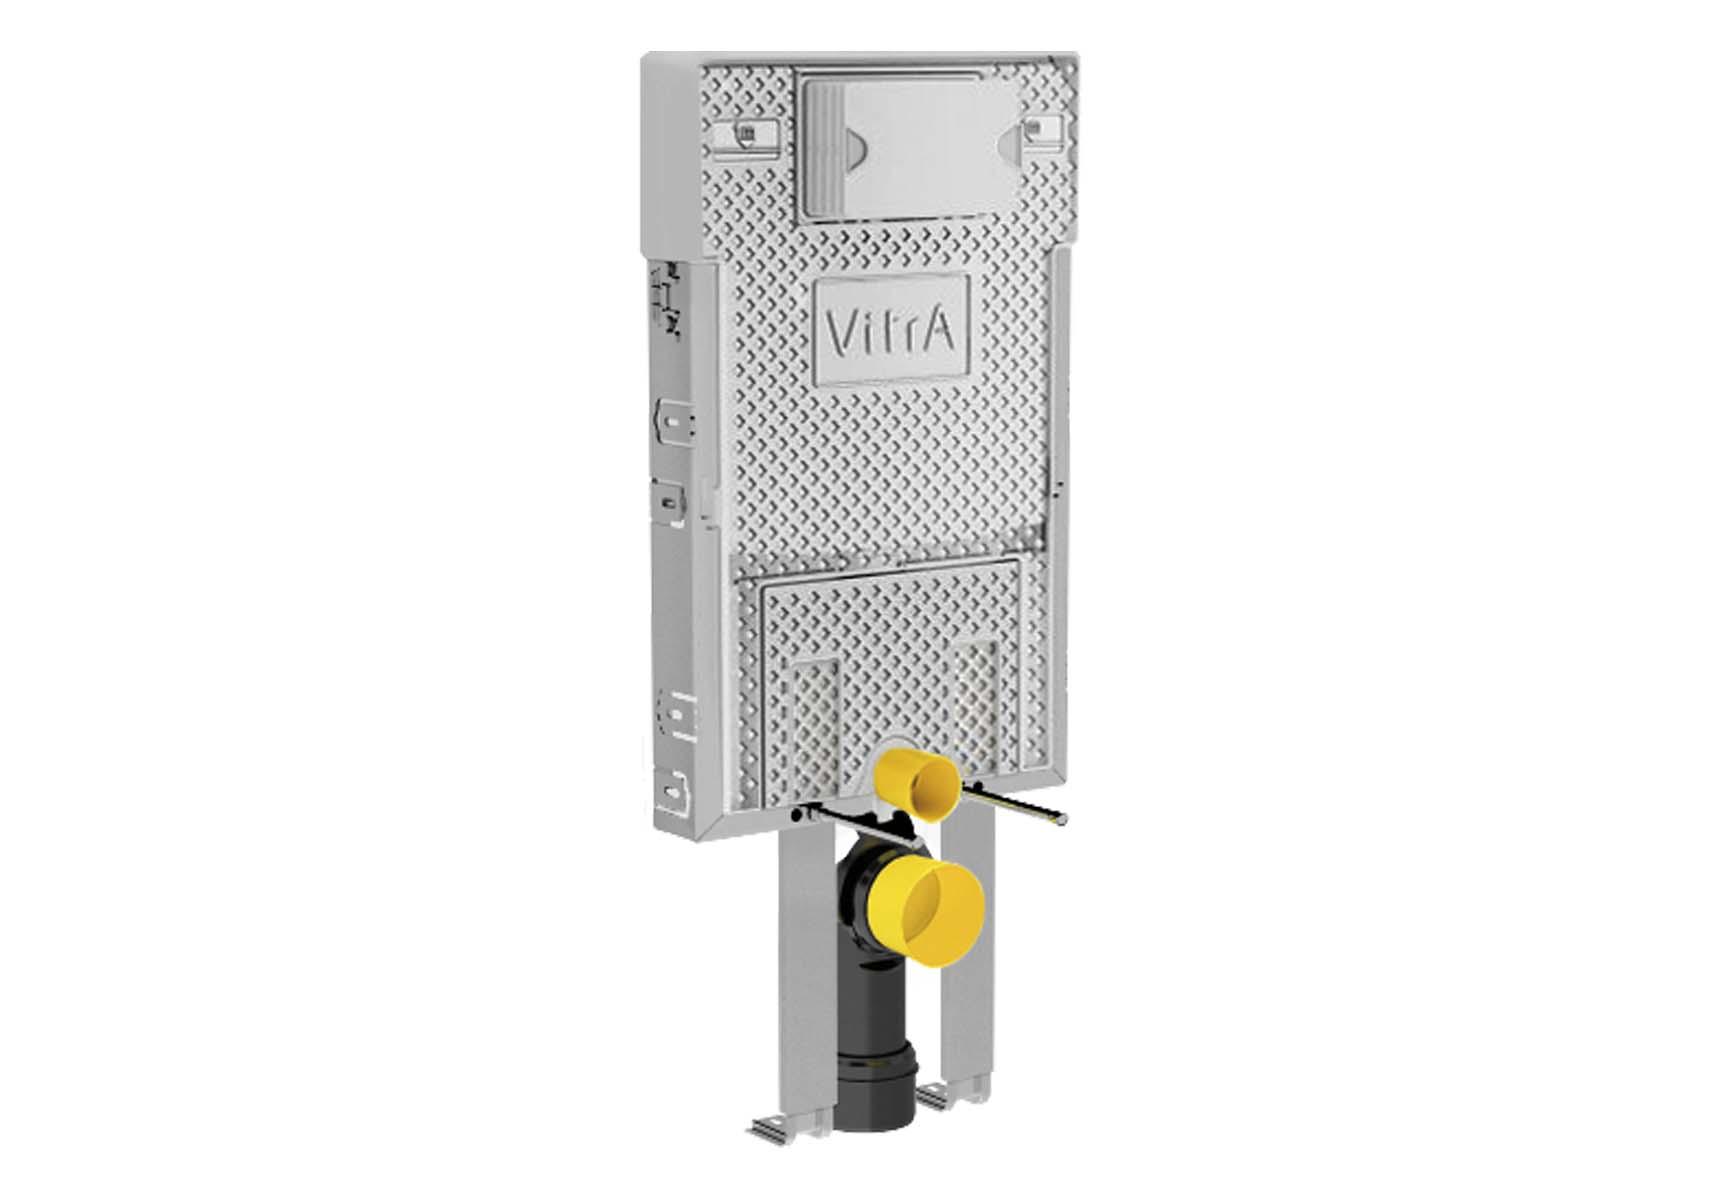 VitrA Pro Standard Installation - 3/6 Liter Concealed Cistern Set (with adjustable thick metal brackets)